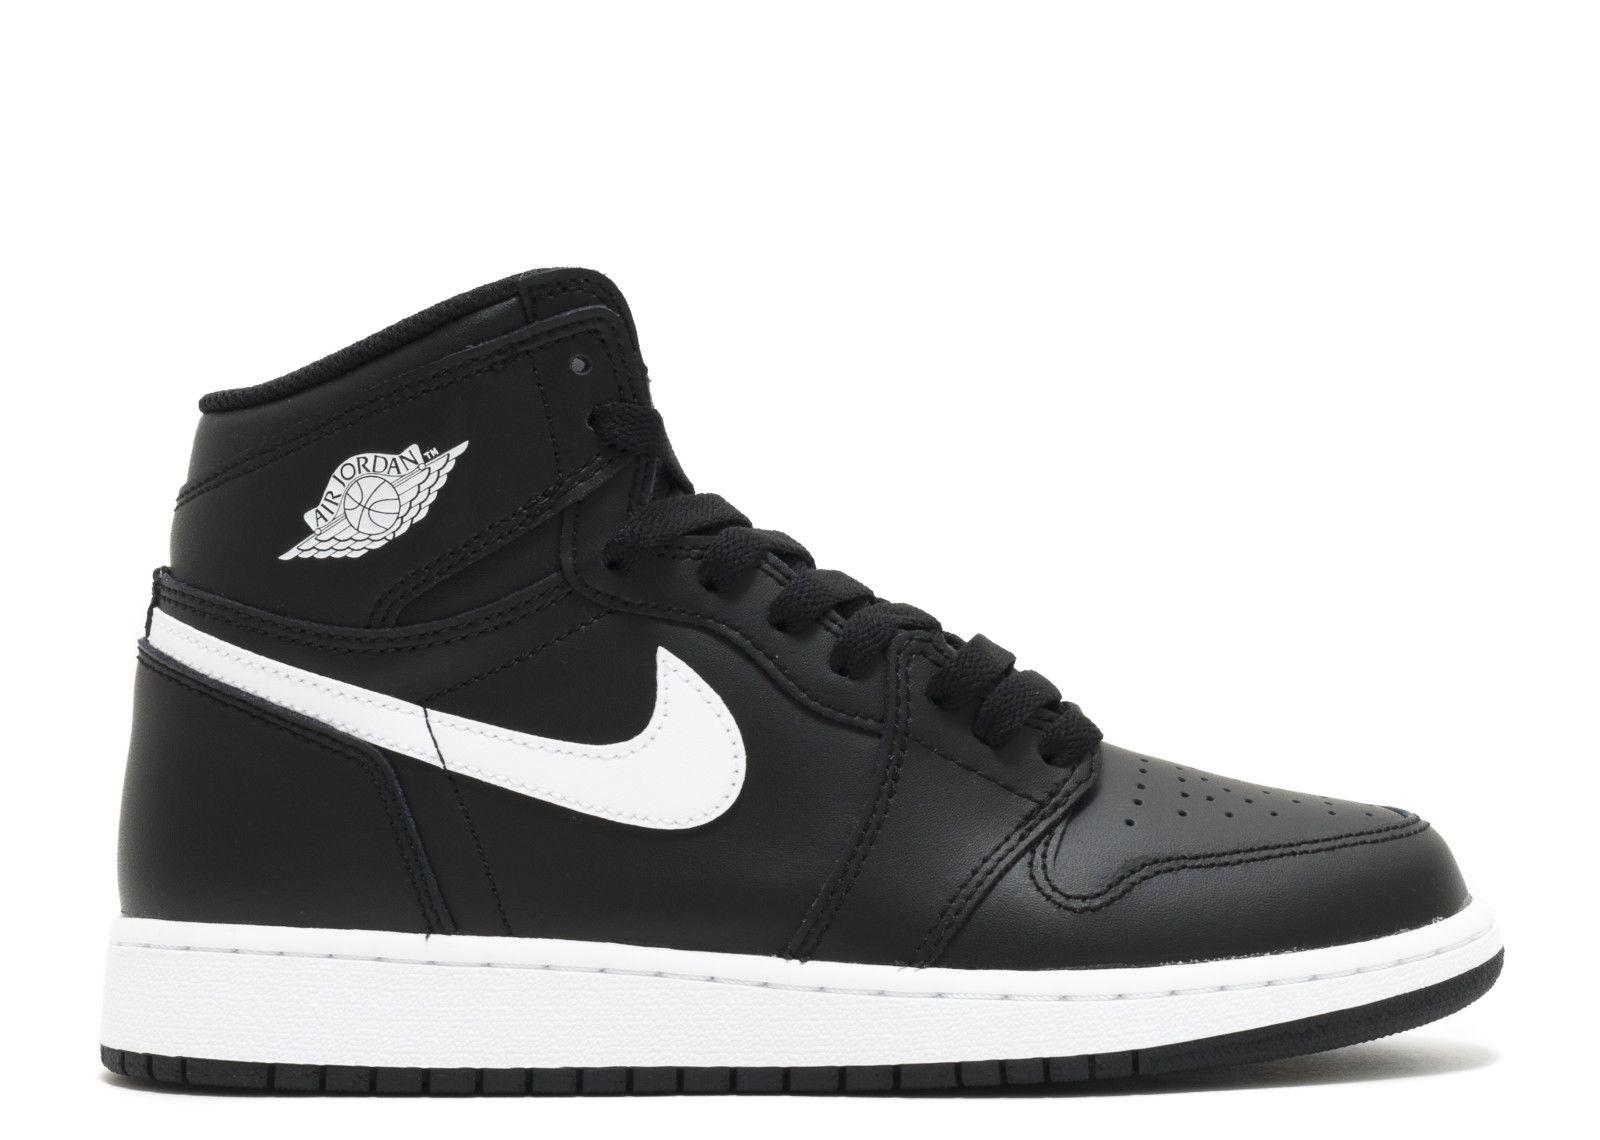 Air Jordan 1 Retro High Og Bg Yin Yang Air Jordan 575441 011 Black Black University Red White In 2021 Jordan Shoes Black Air Jordans Jordan 1 Retro High